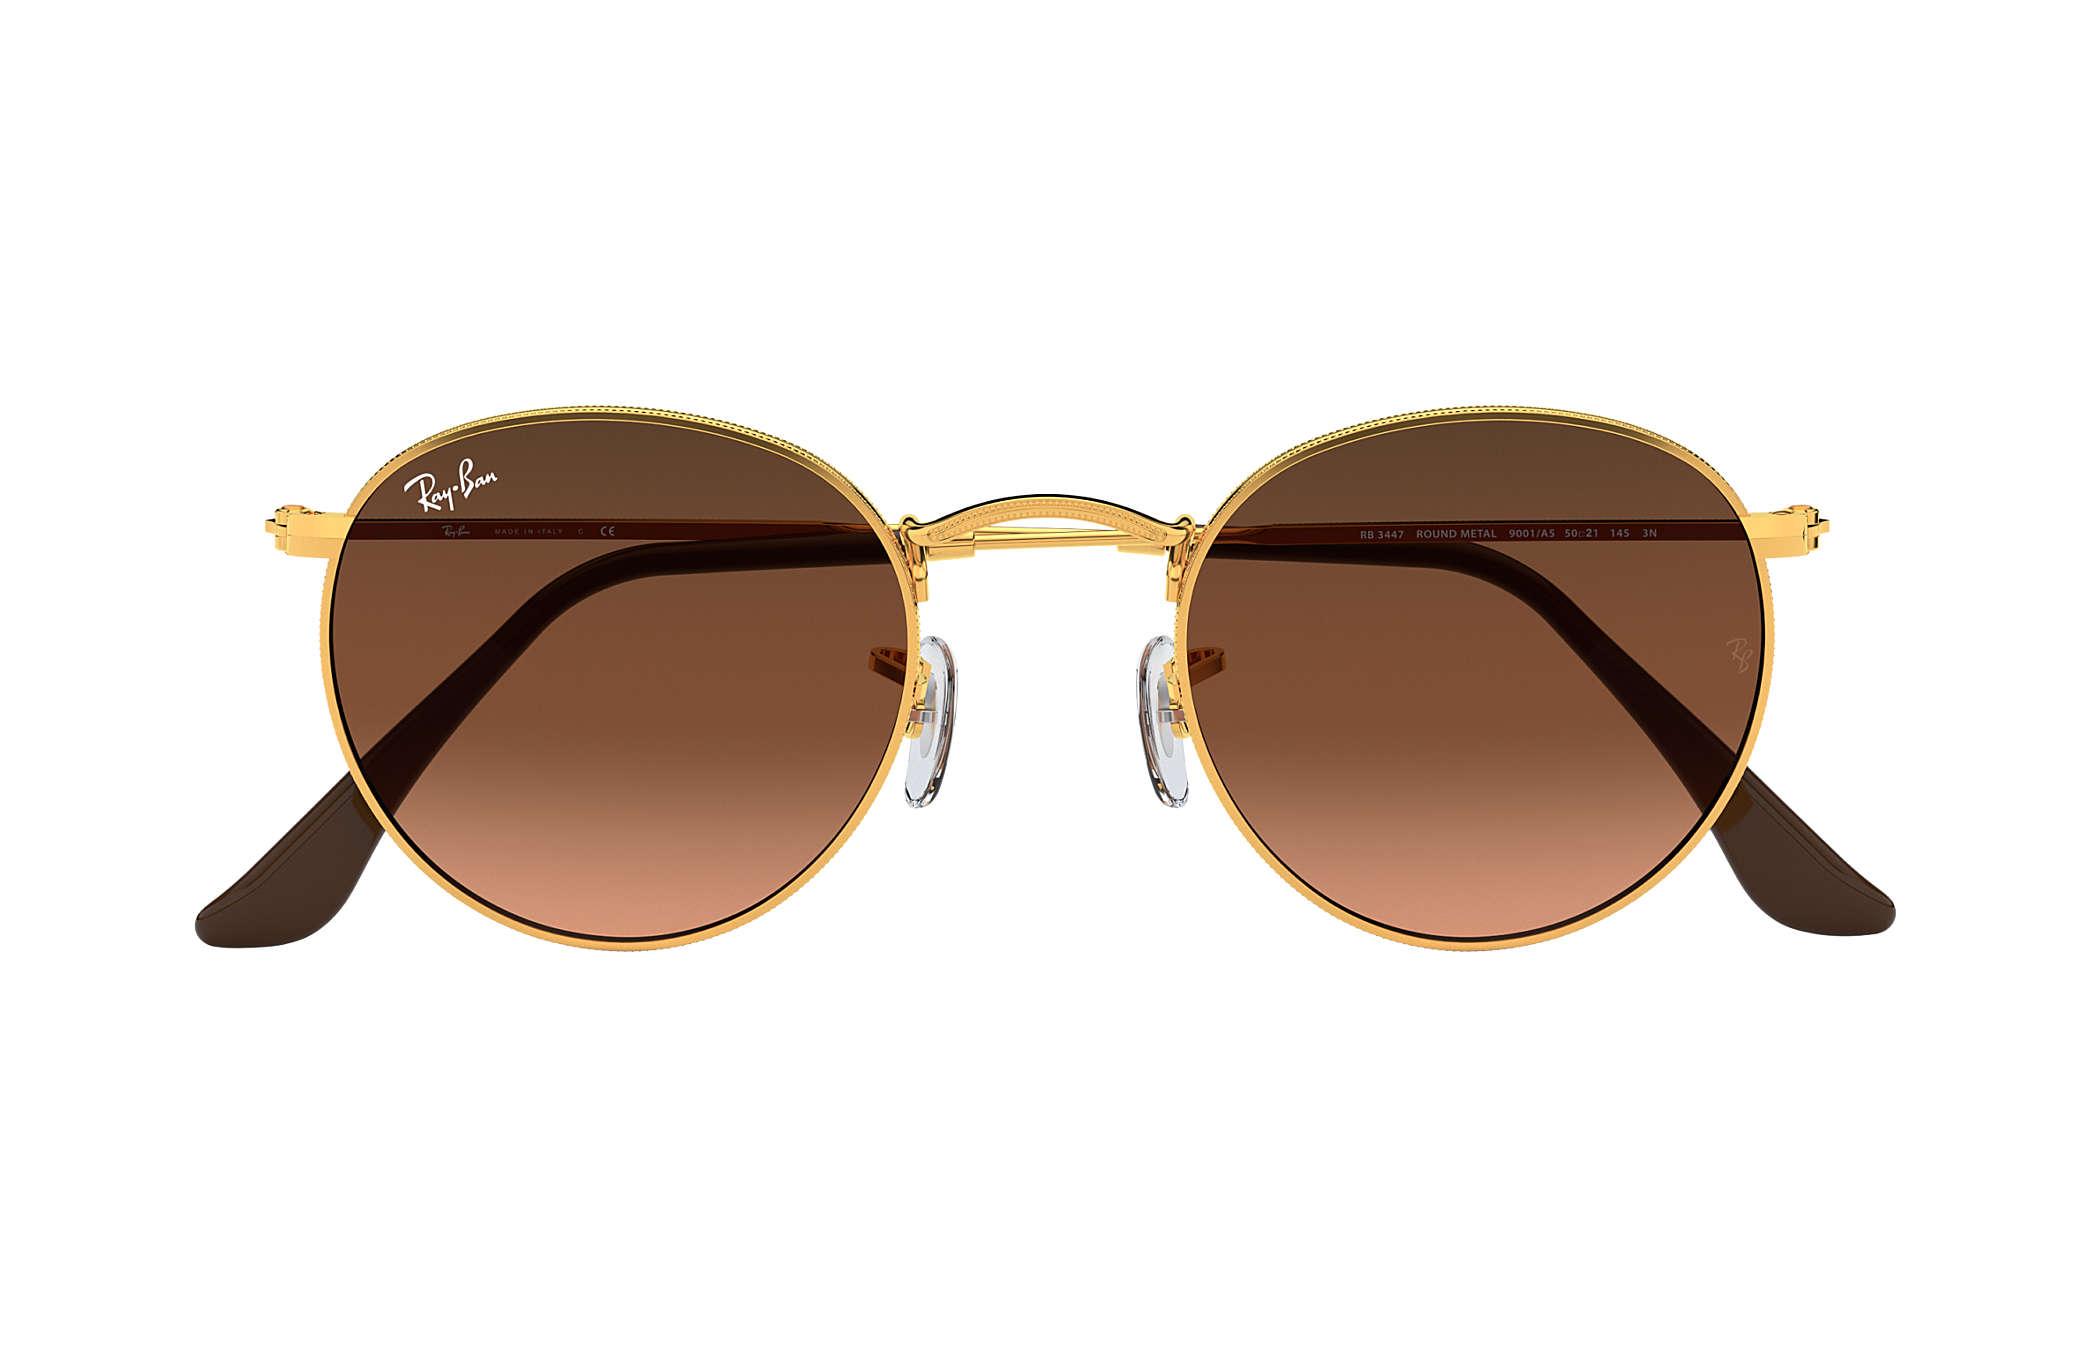 9fef9b4da3 Ray-Ban Round Metal RB3447 Bronze-Copper - Metal - Pink Brown Lenses ...